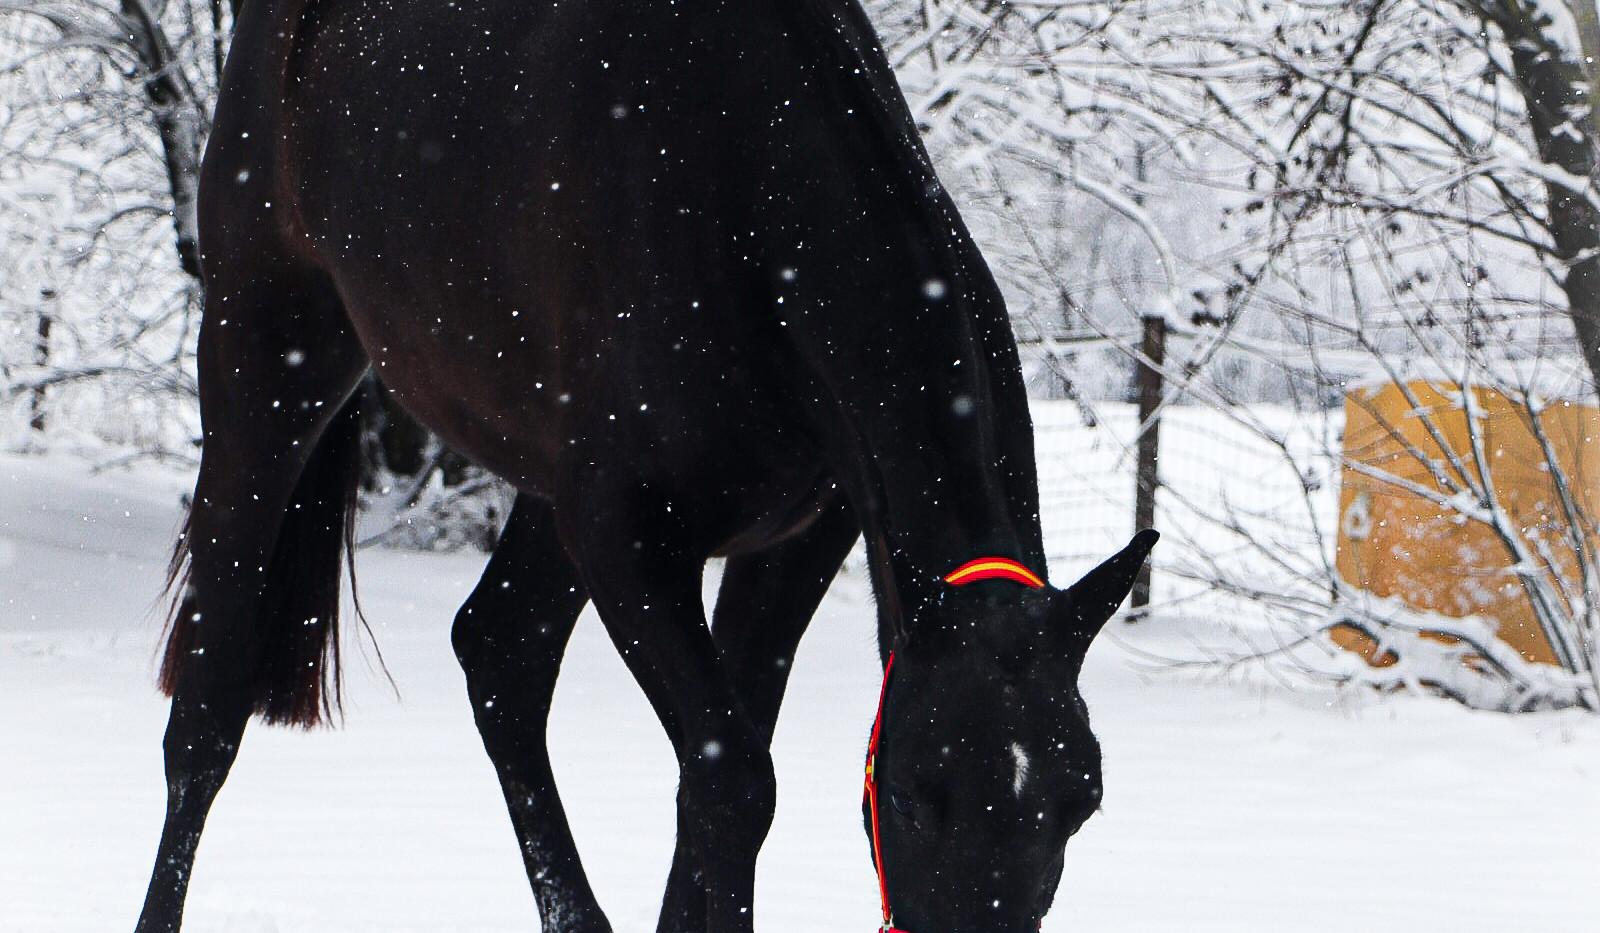 #pre #purarazaespañola #premare #chevalibérique #chevalespagnol #spanischepferde #purraceespagnol #iberischepferde #beautifulhorses